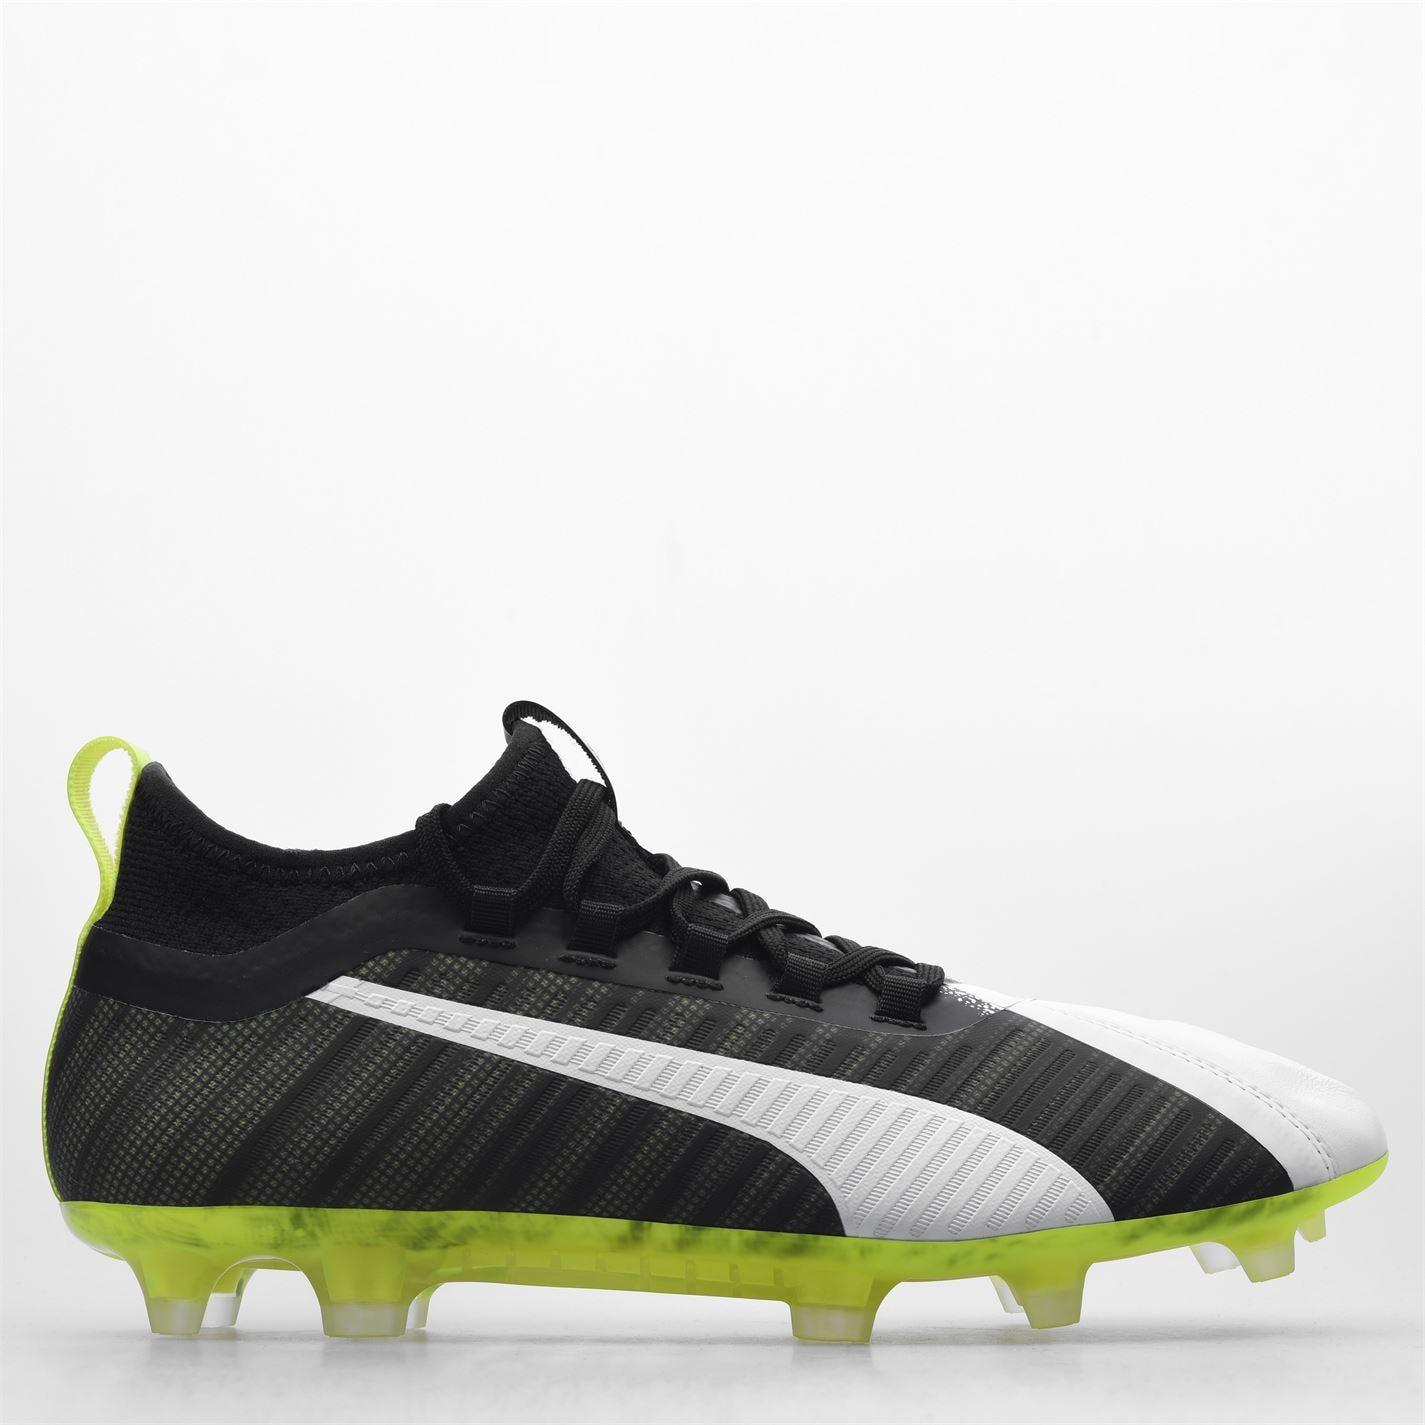 miniature 16 - Puma-5-2-FG-Firm-Ground-Football-Bottes-Homme-Chaussures-De-Foot-Crampons-Baskets